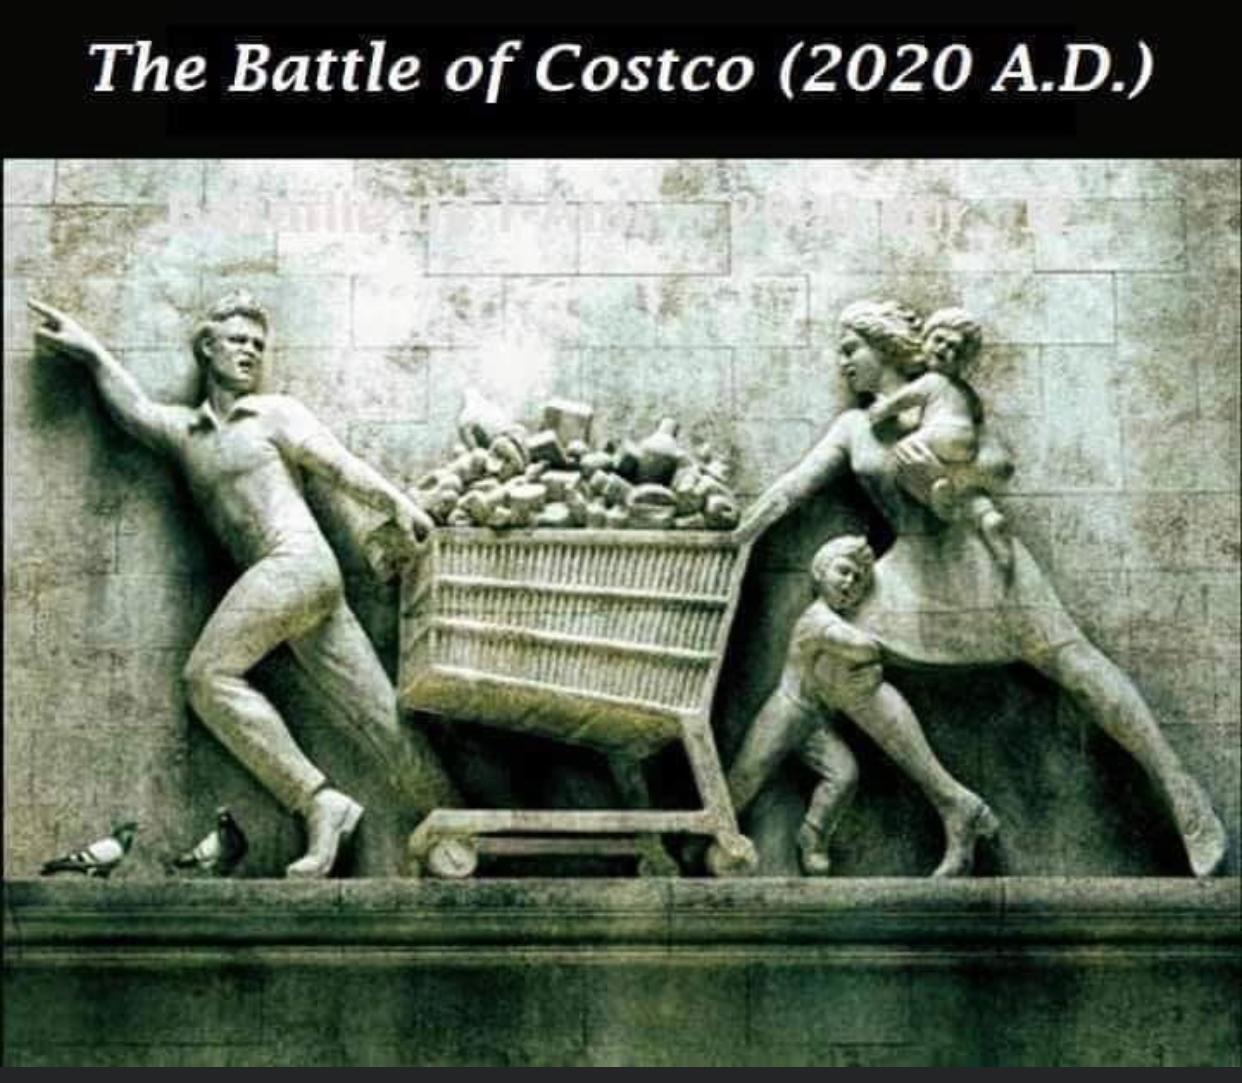 History lesson of the future! 😀